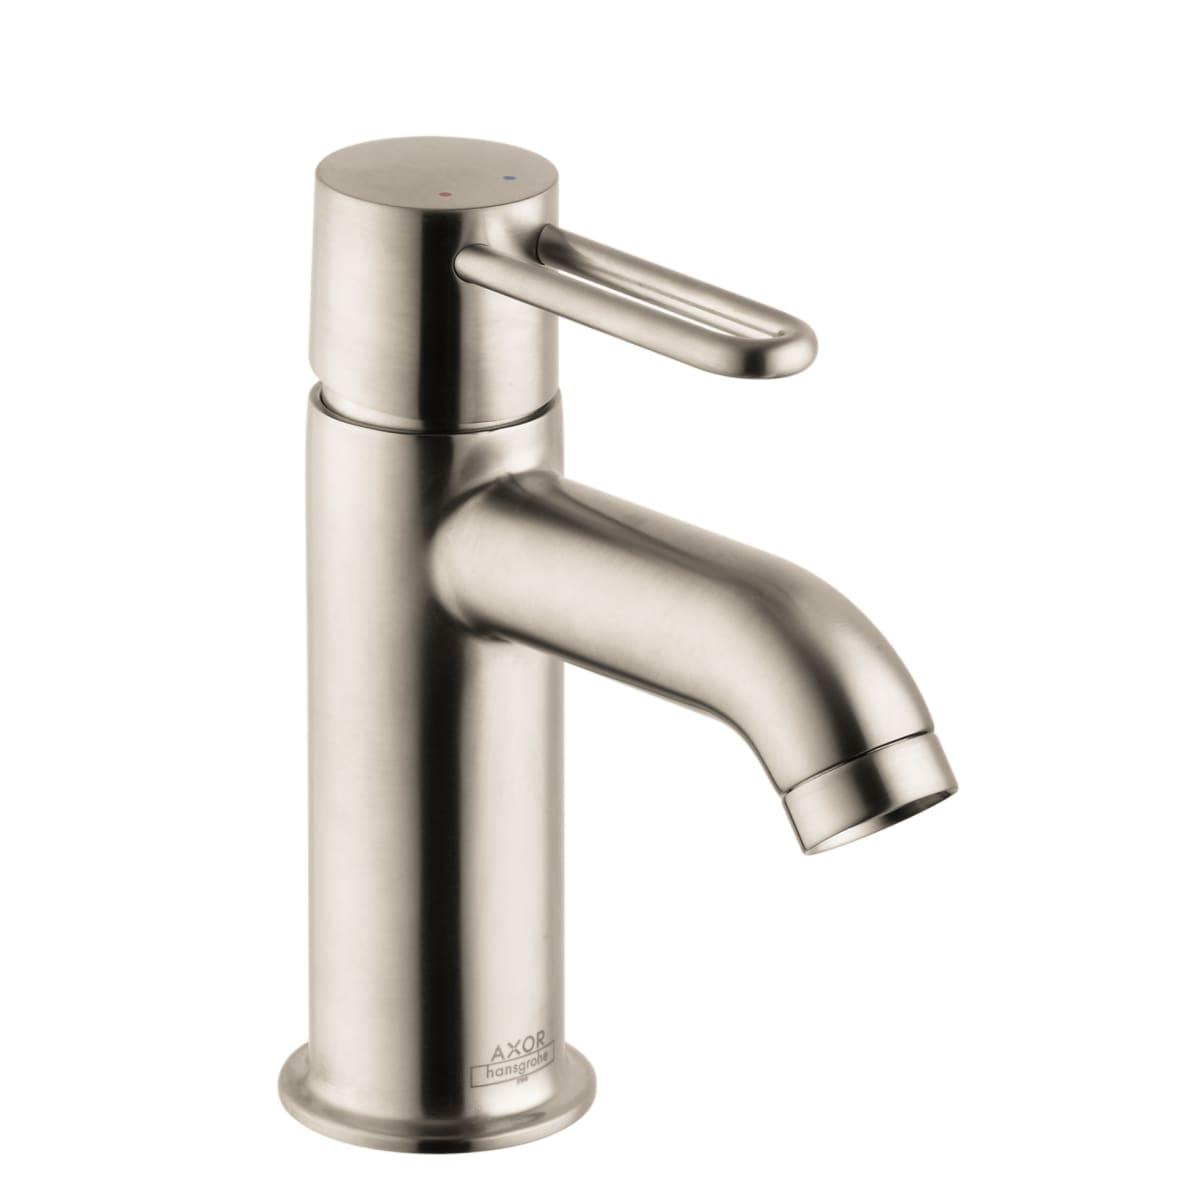 Axor 38020001 Chrome Uno 1.2 GPM Single Hole Bathroom Faucet with ...